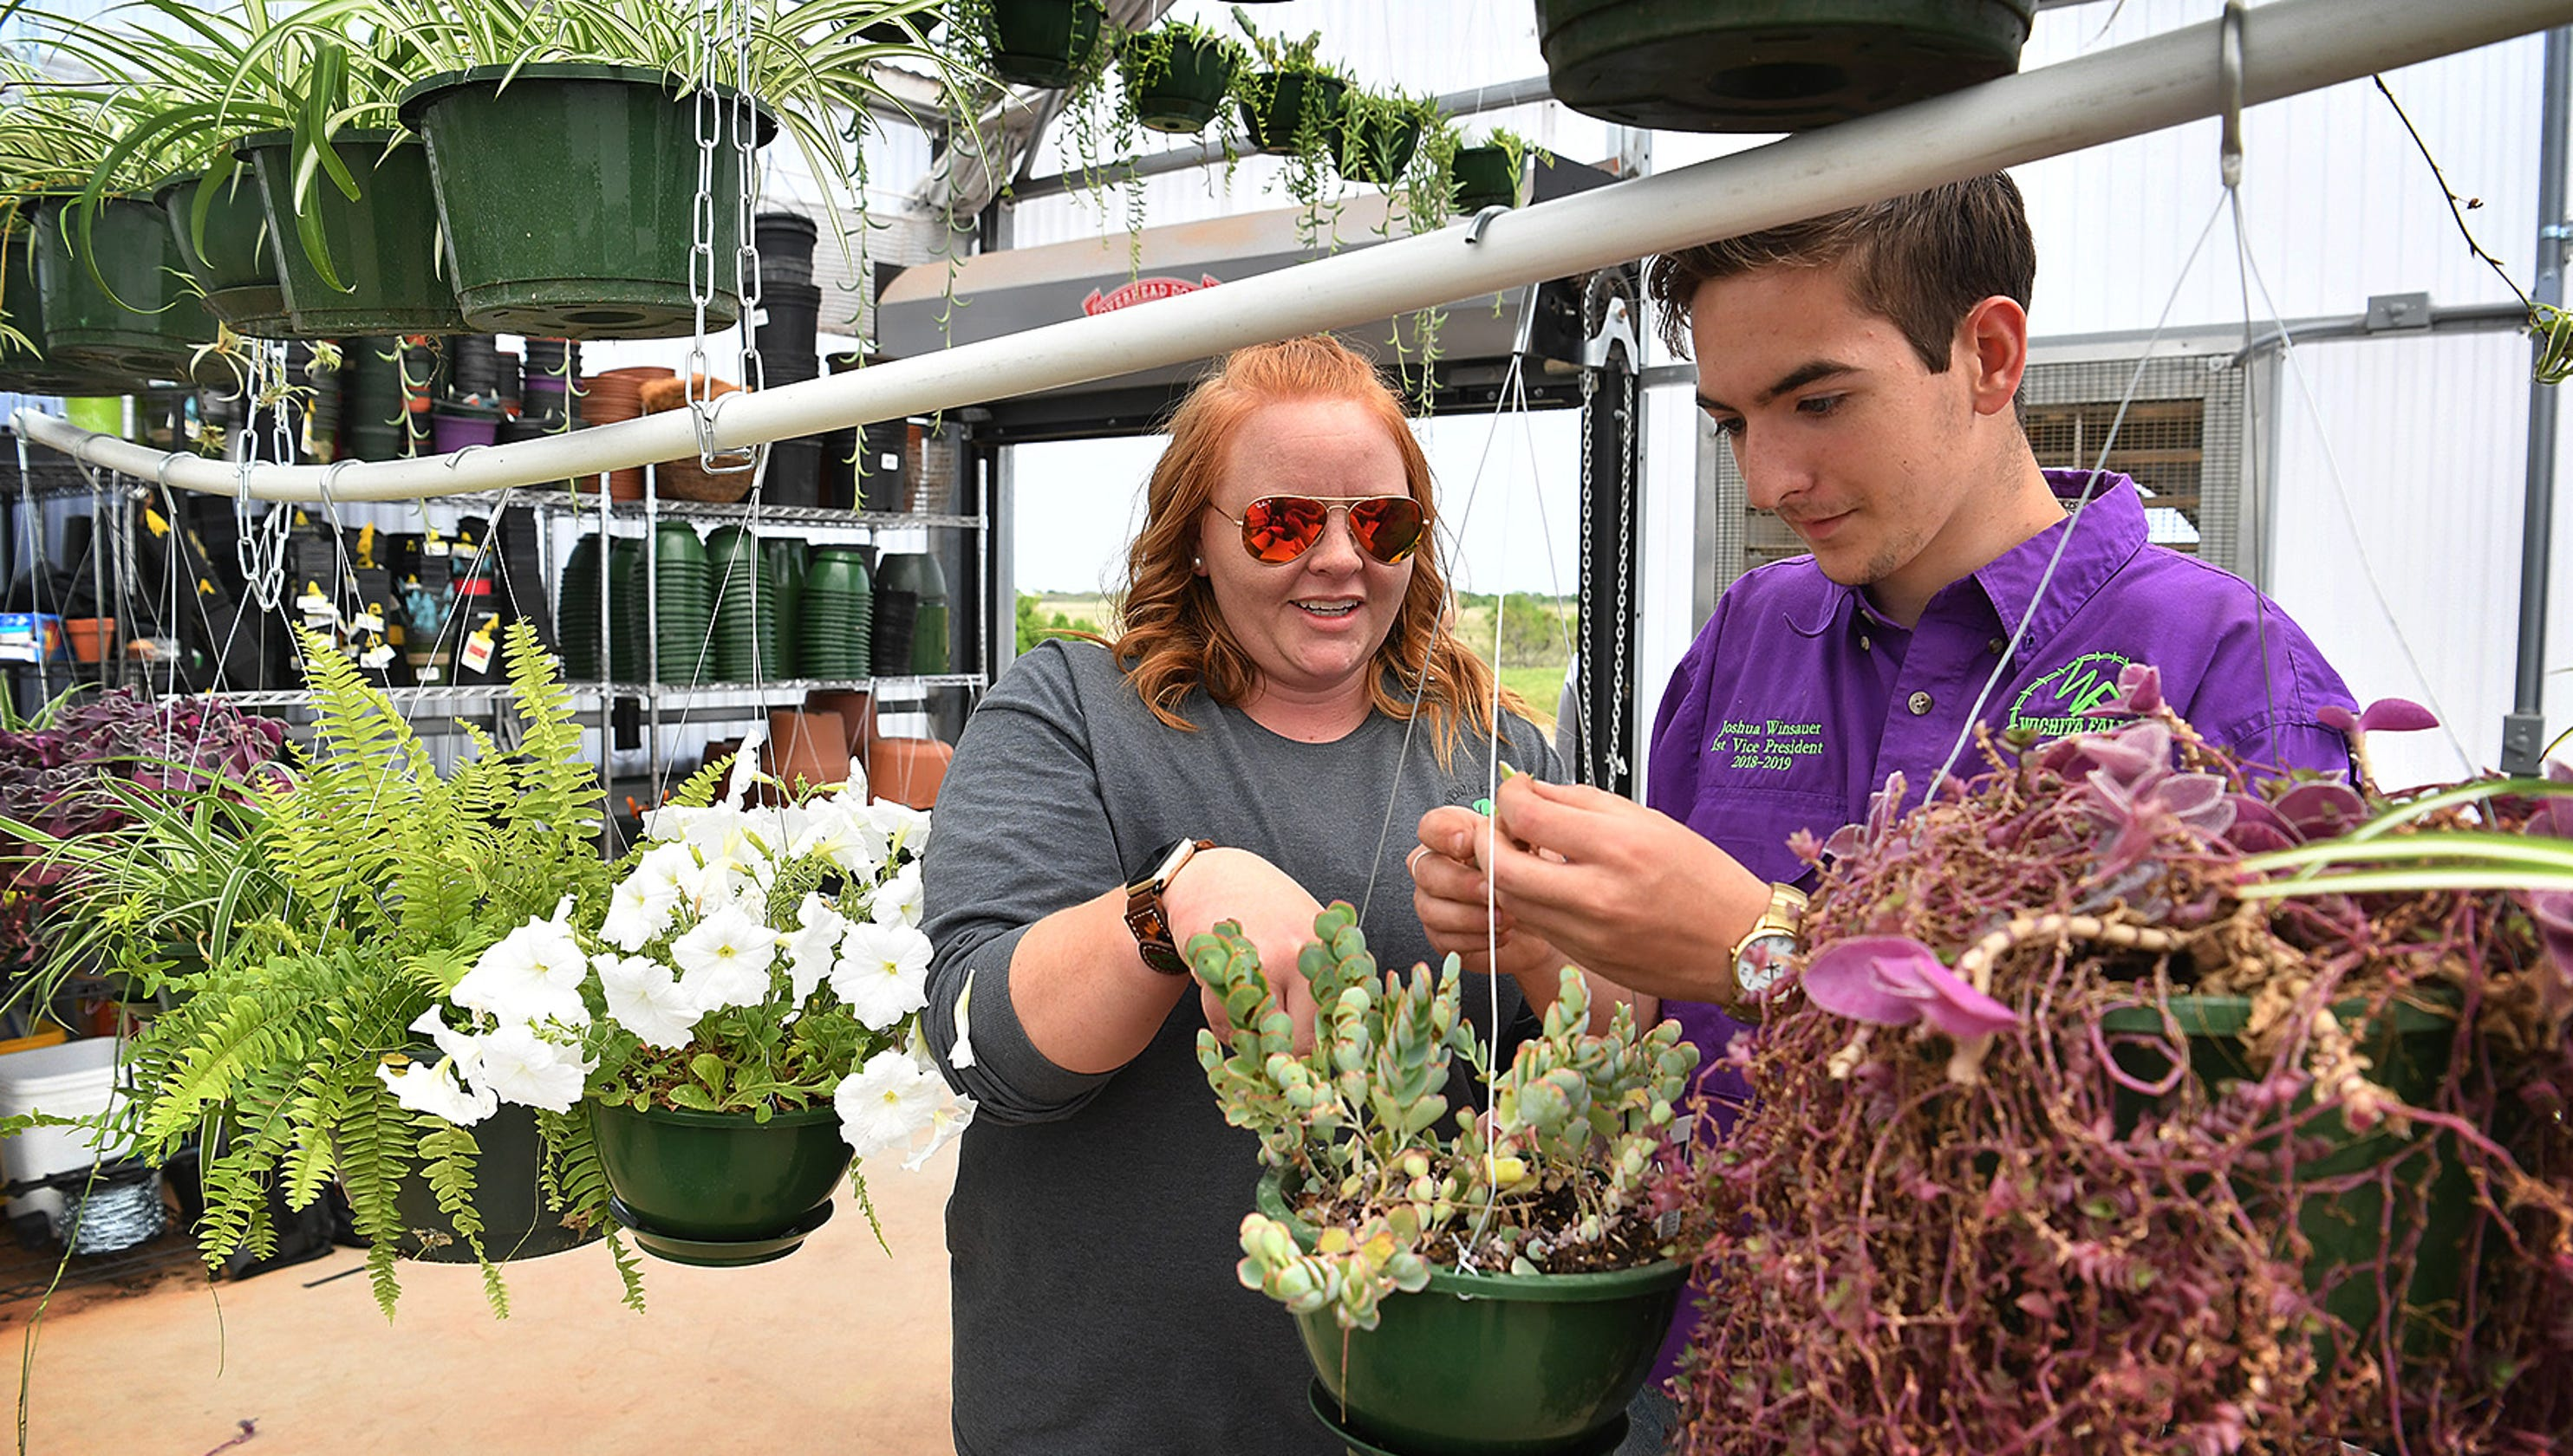 Horticulture students hold annual plant sale at campus greenhouse on green lavender, green gardening, green butternut squash, green beets, green bonsai, green tulips, green nature, green shrubs, green bushes, green perennial, green garden design, green flowers,